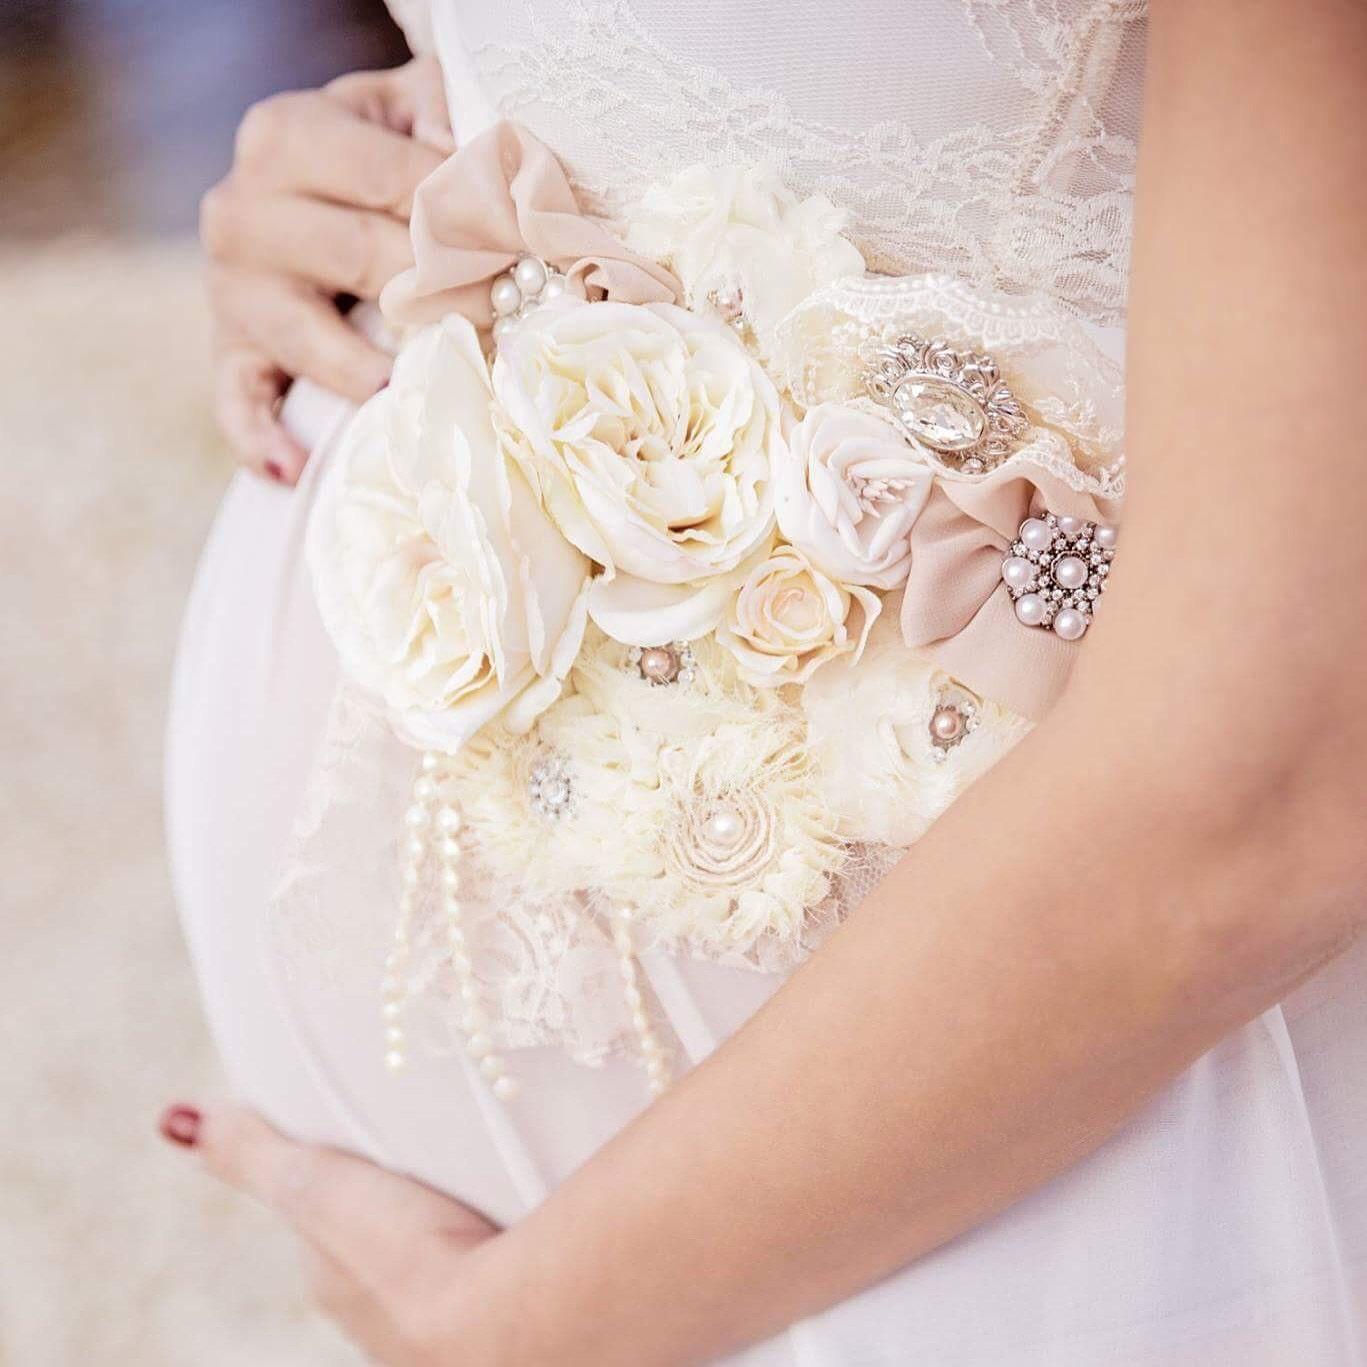 3 In 1 Vintage Beige Ivory Maternity Sash Bridal Sash Baby